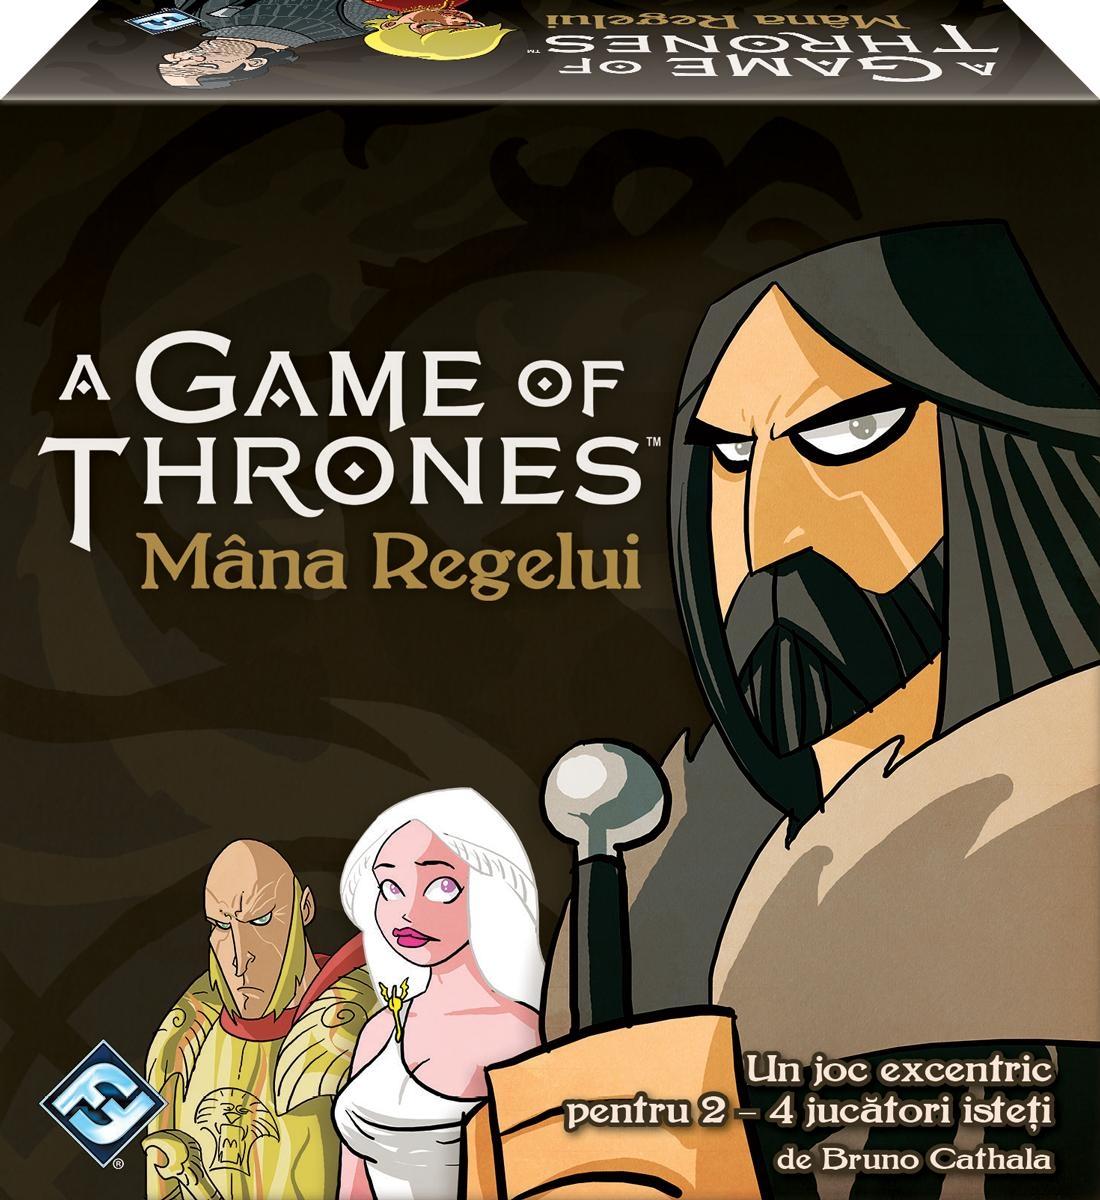 A Game of Thrones - Mana Regelui | Fantasy Flight Games